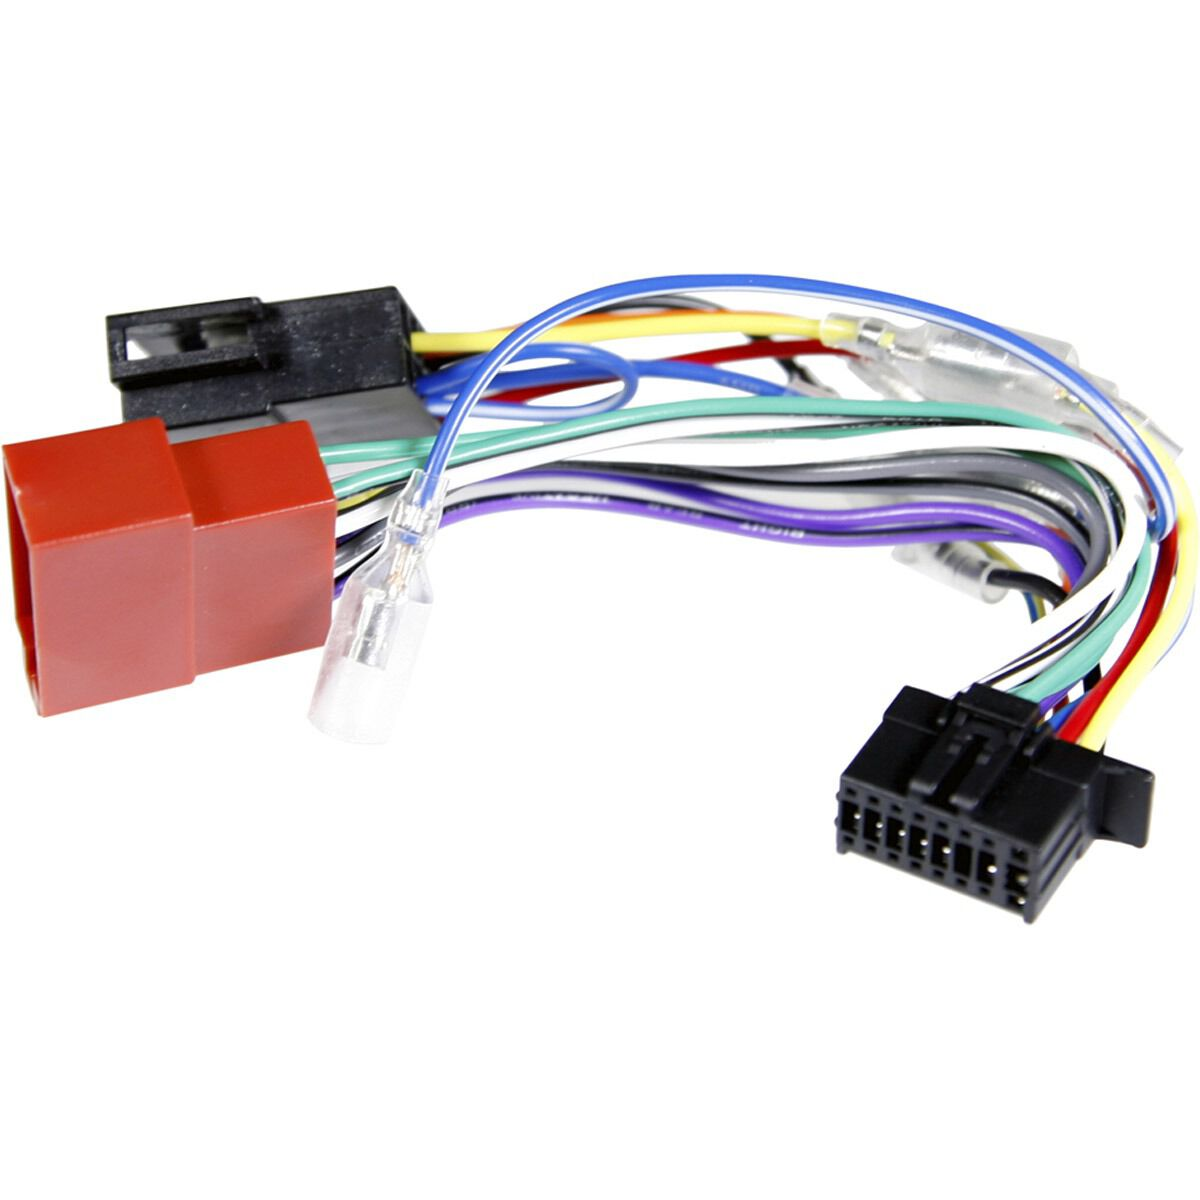 small resolution of aerpro wiring harness suit jvc head units app8jvc5 jvc to pioneer wiring harness jvc wiring harness